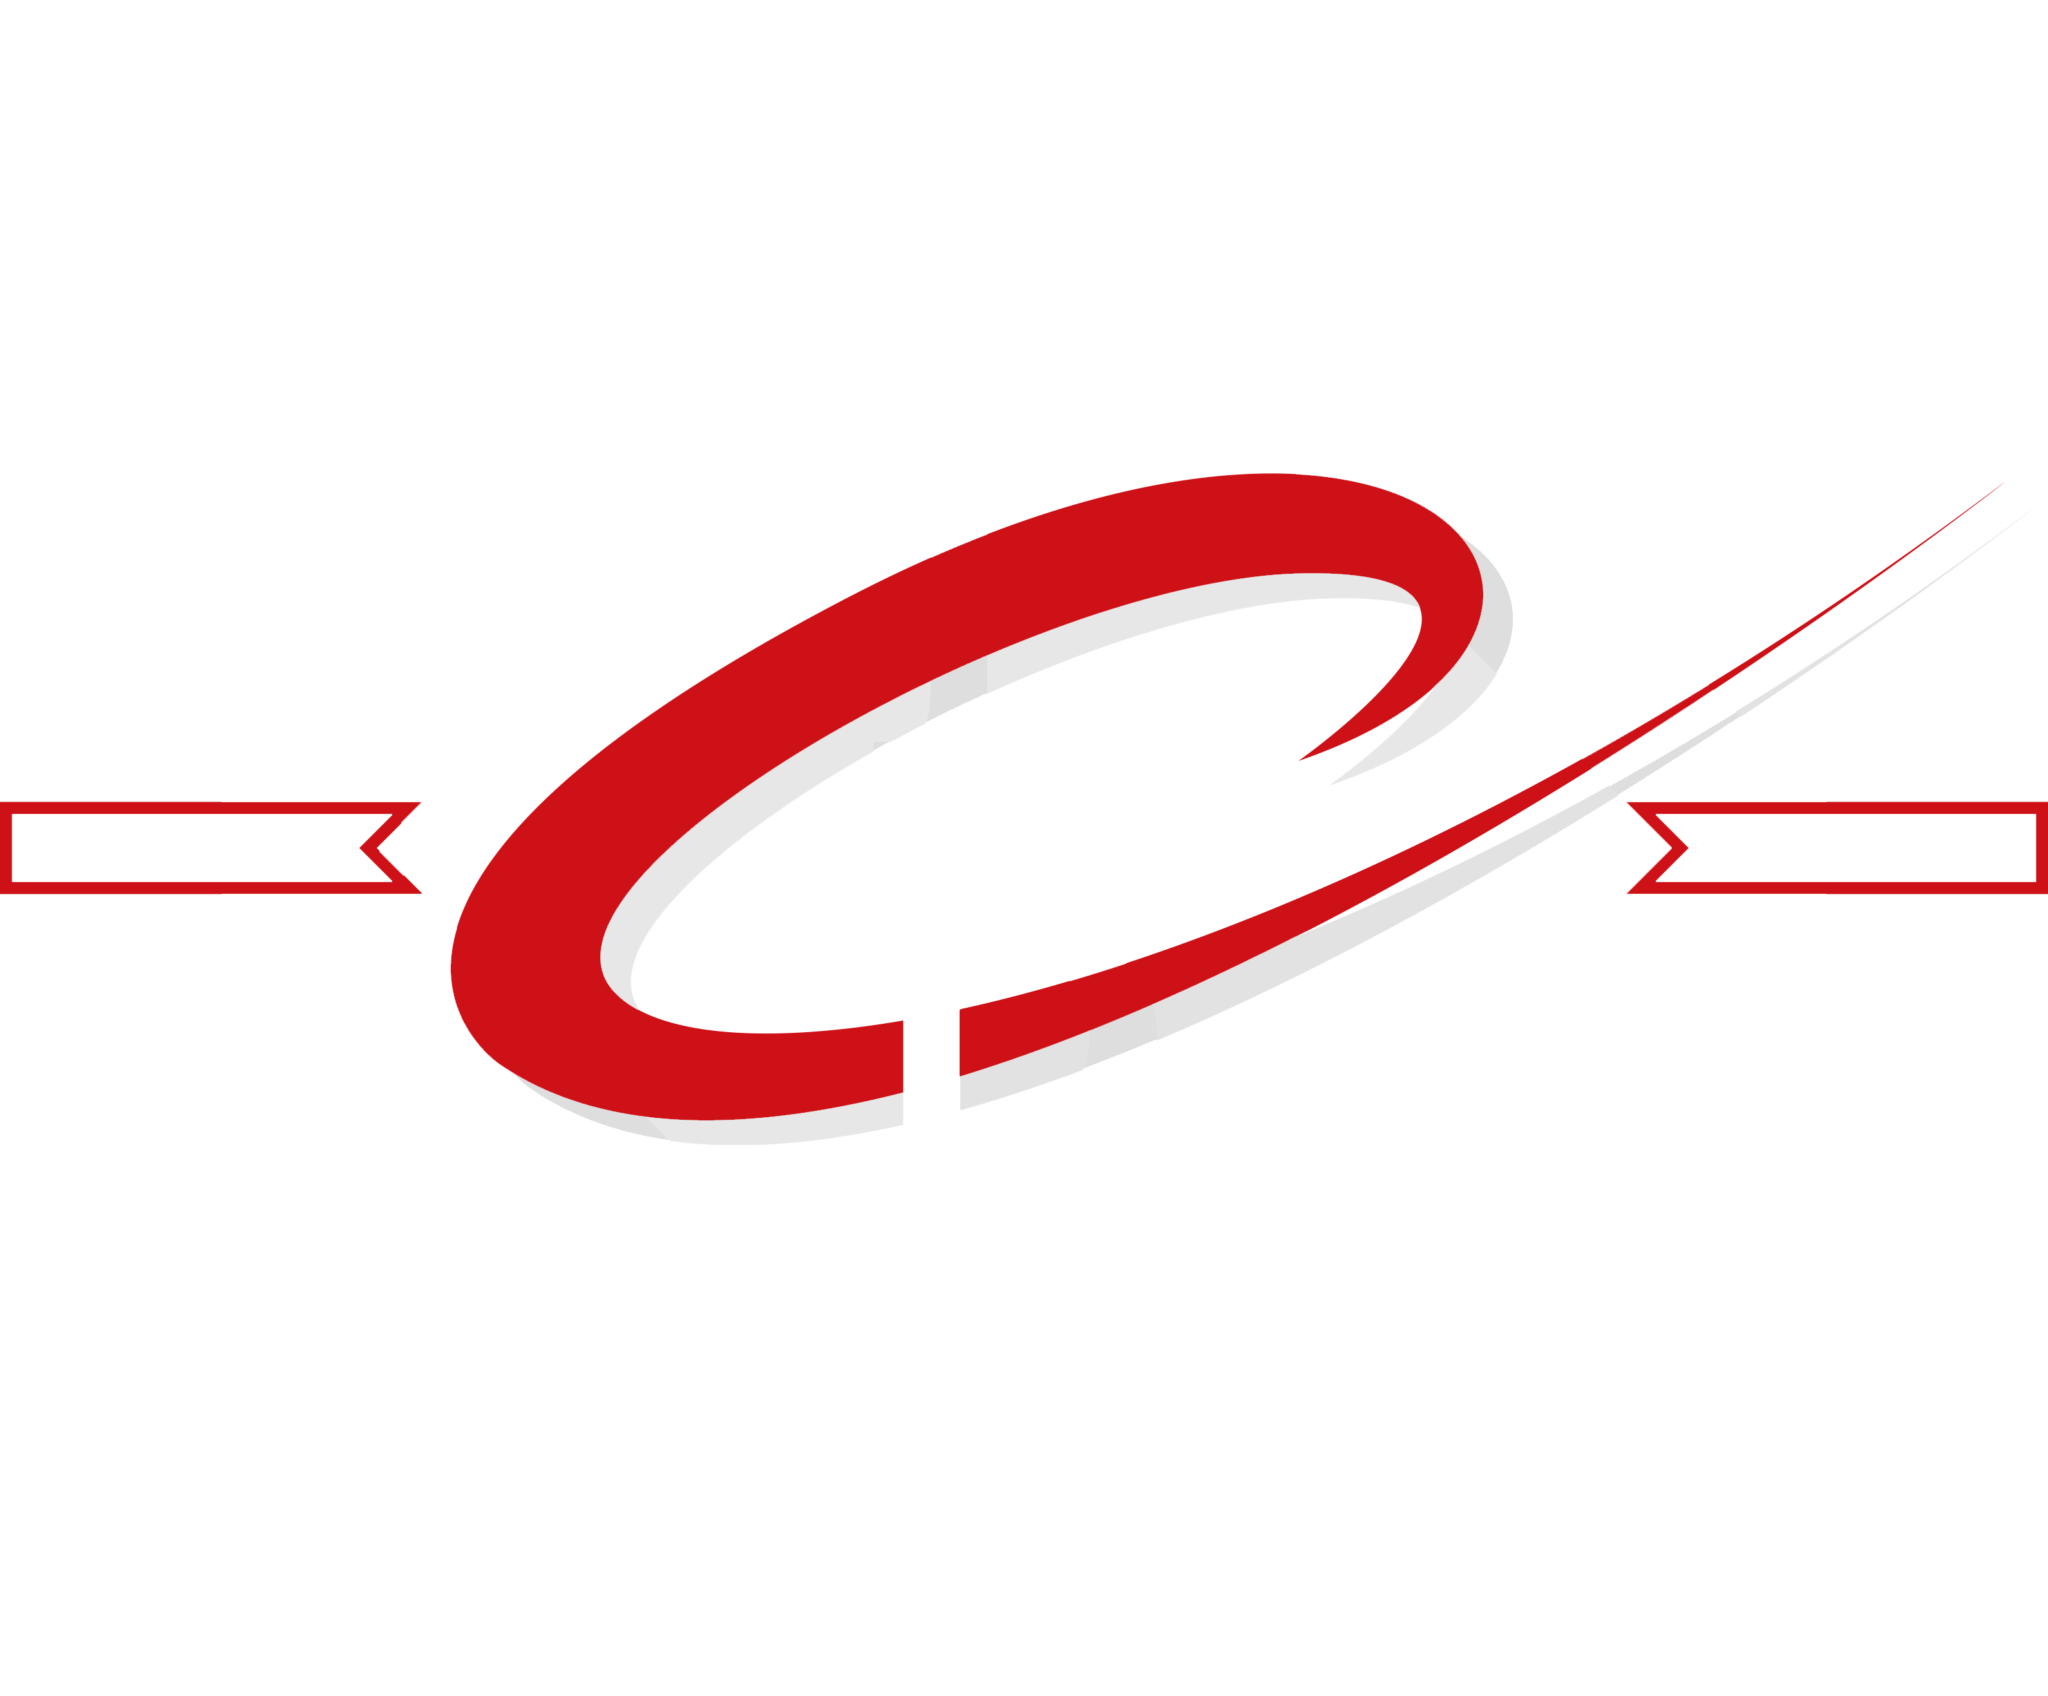 CLR Construction Group